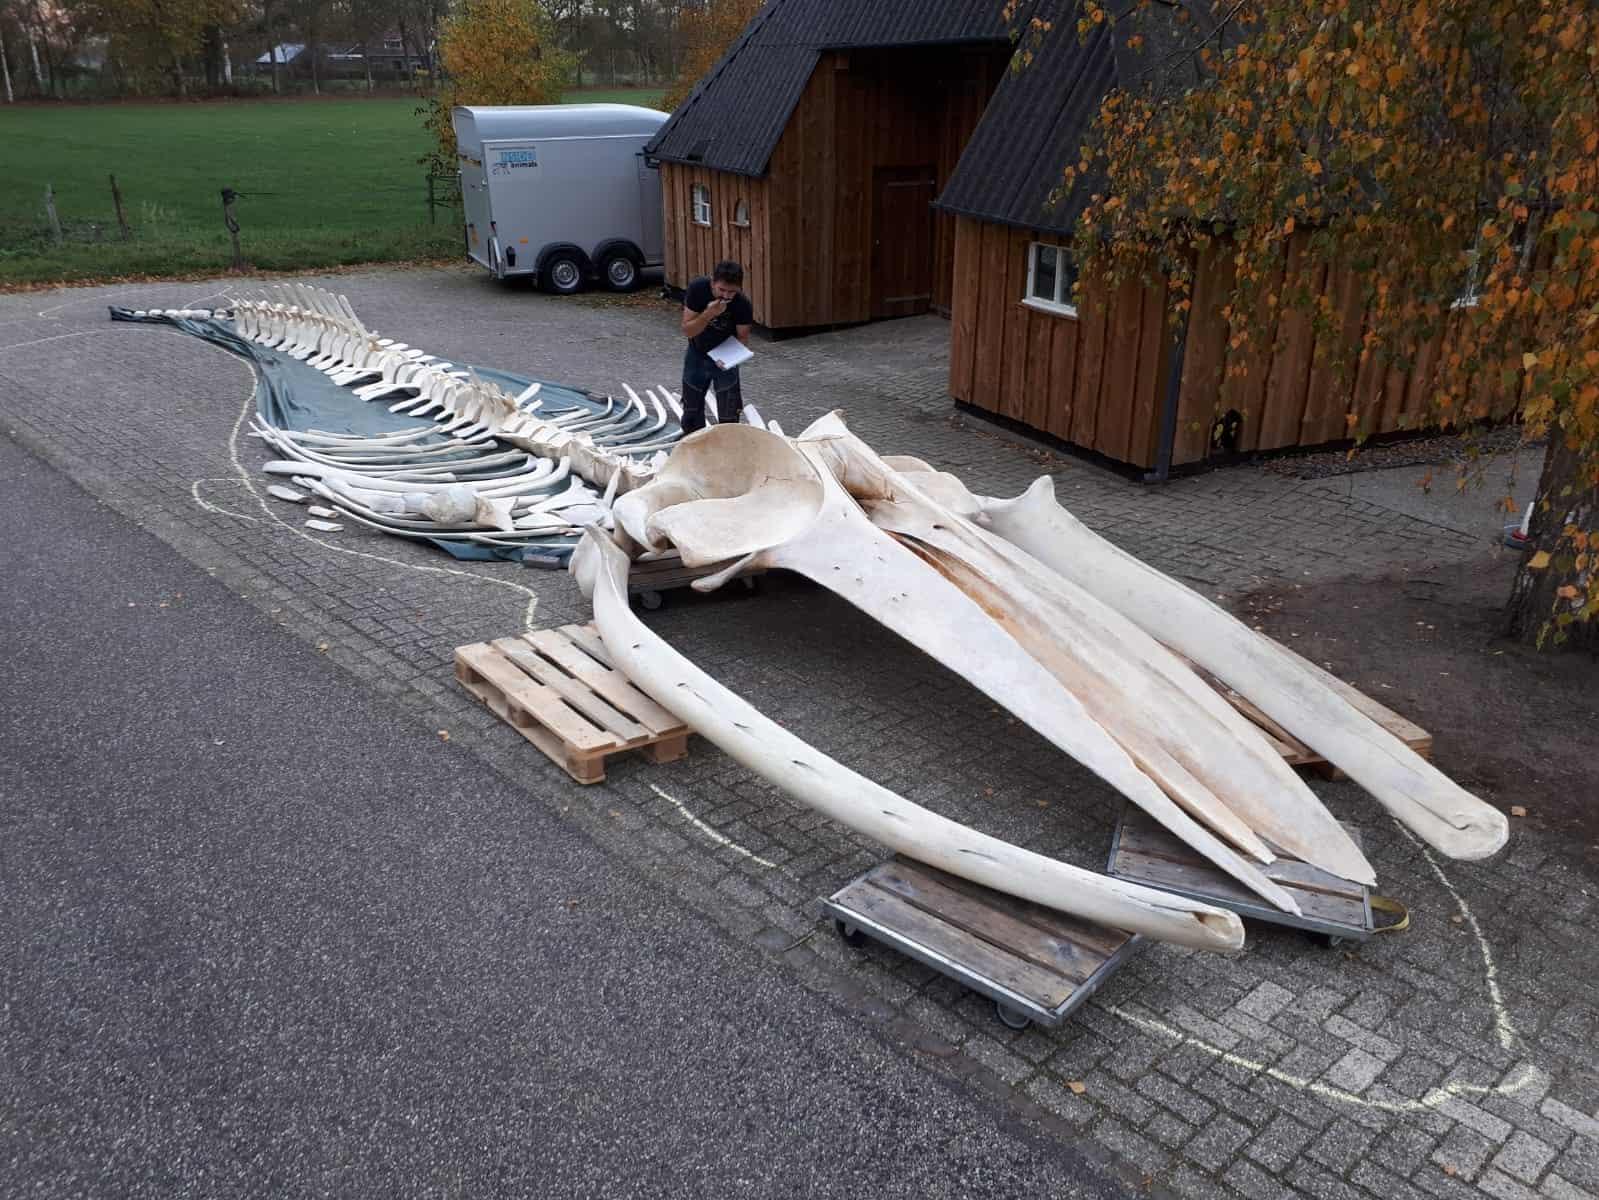 Skelette | Finnwal 17,5 meter | Naturalis Biodiversity Center